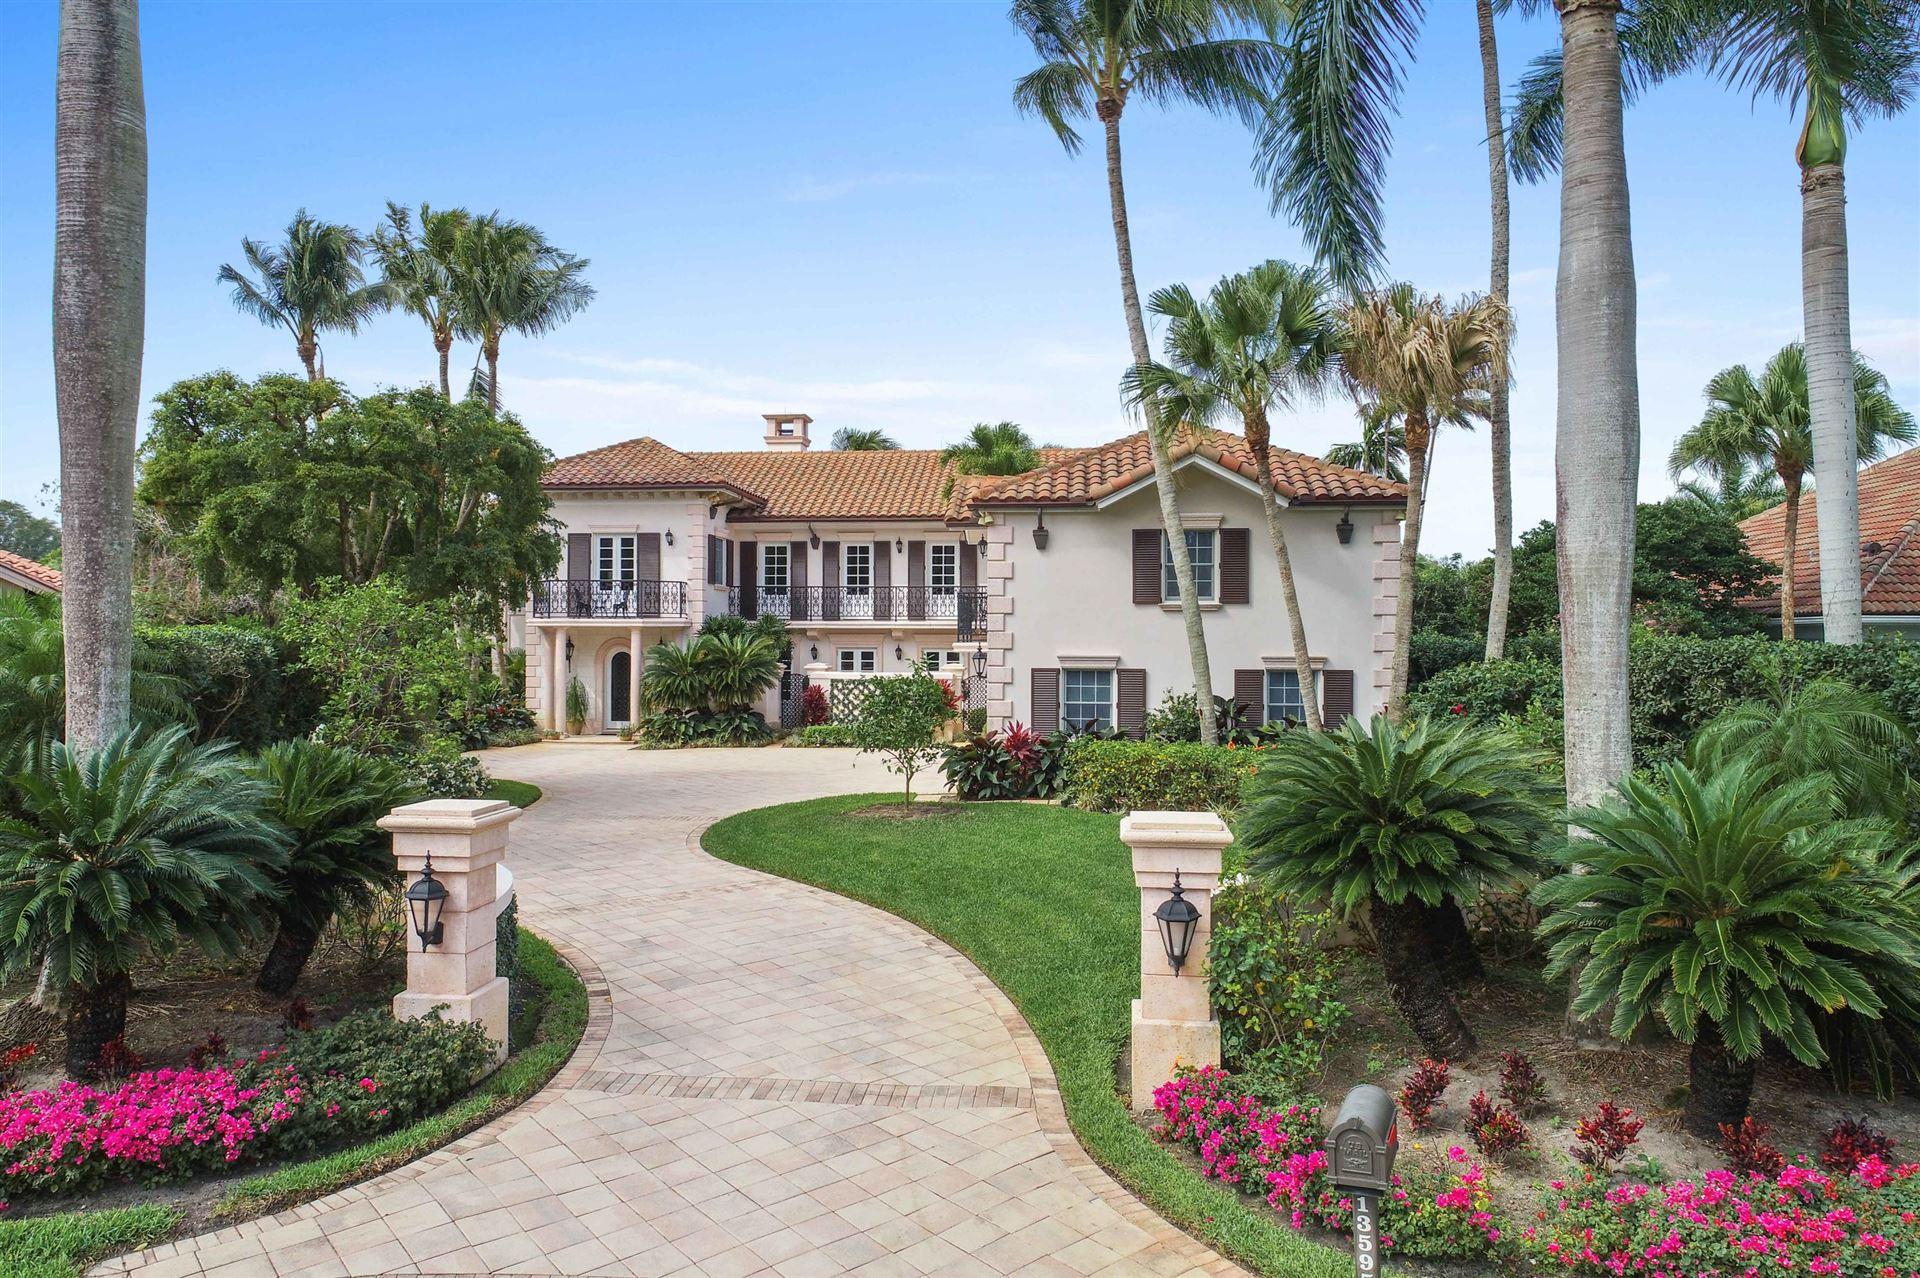 Photo of 13595 Rhone Circle, Palm Beach Gardens, FL 33410 (MLS # RX-10696686)